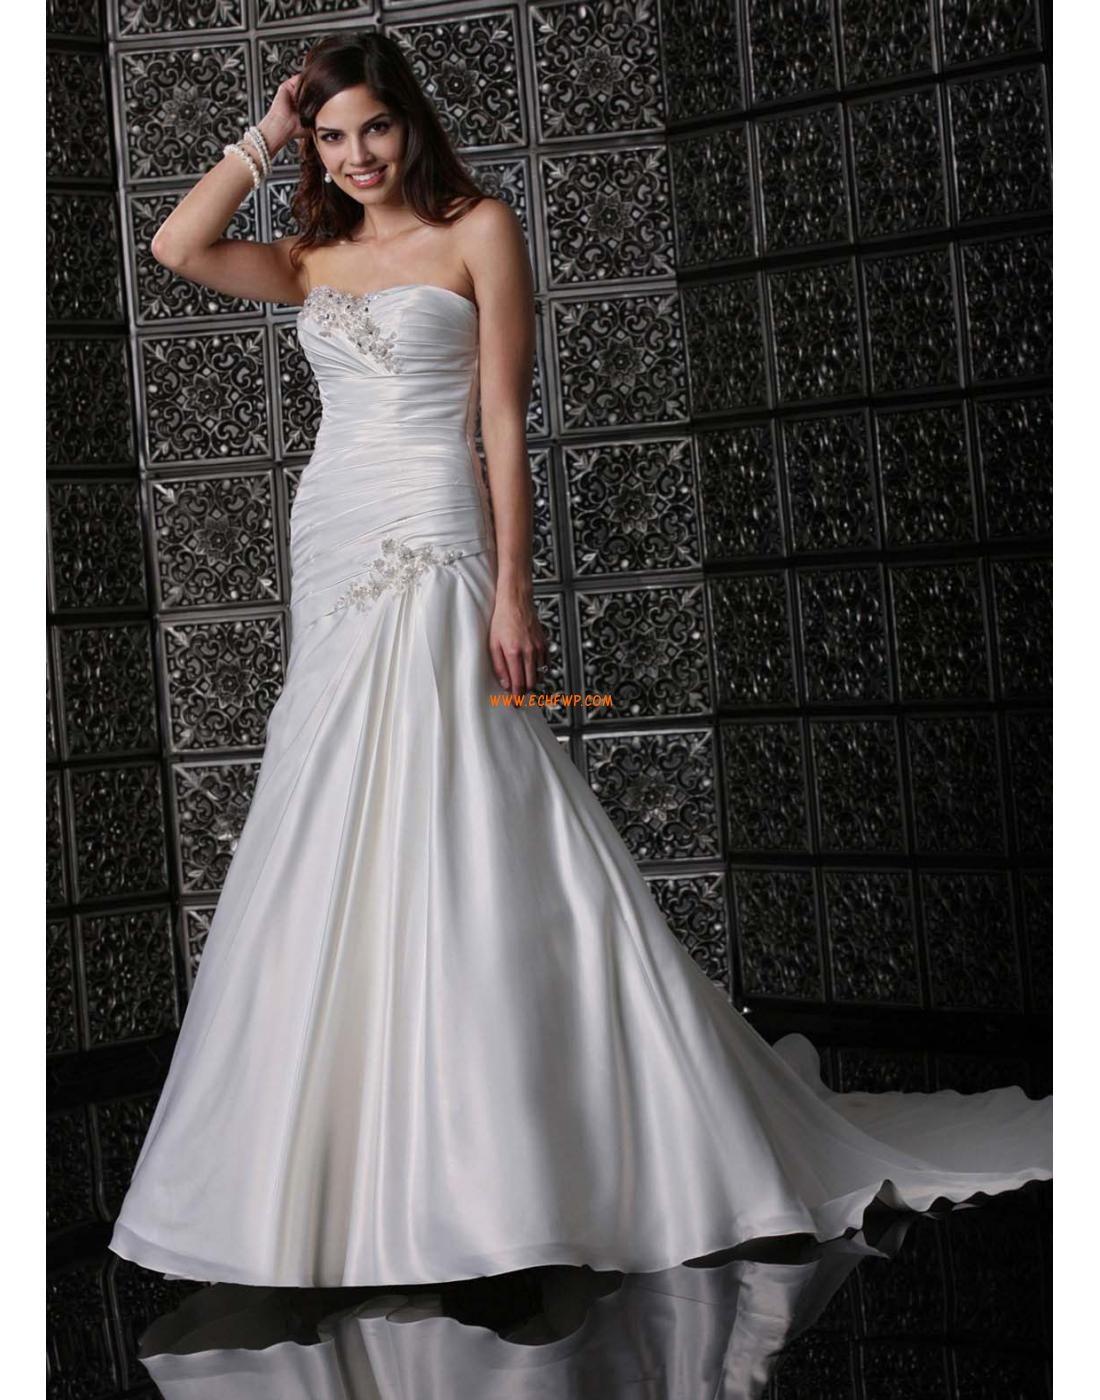 194f43697b4 Discount Bridal Gowns Austin Tx